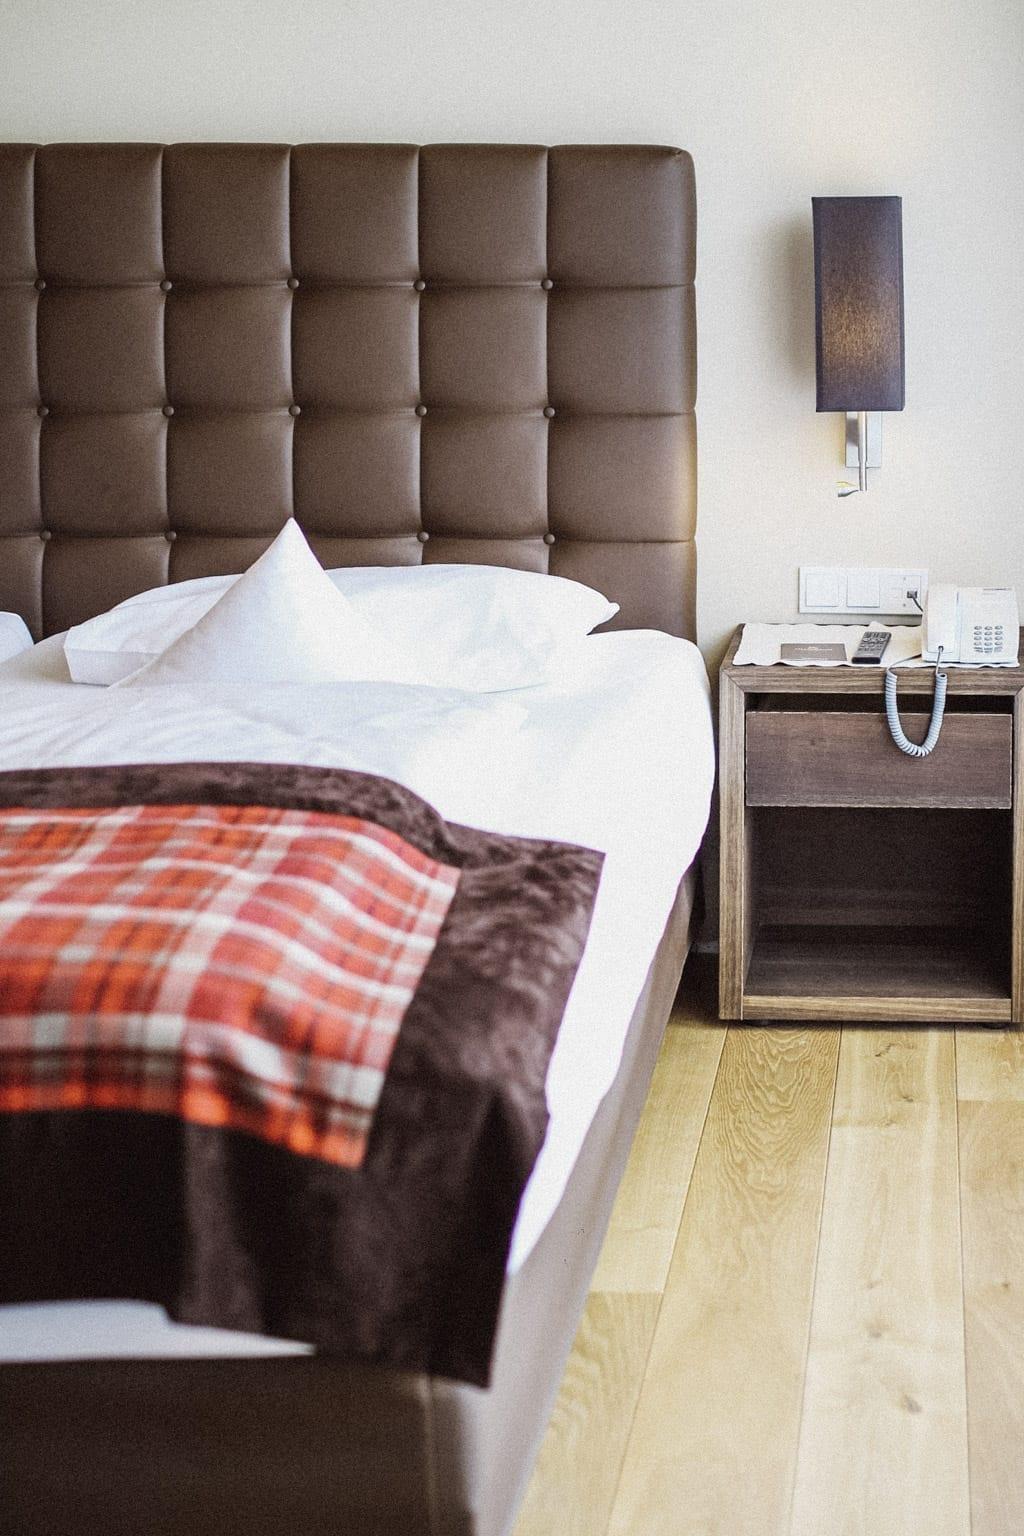 ck-constantlyk-com-karin-kaswurm-achensee-luis-trenker-hotel-kronthaler-tirol-0524